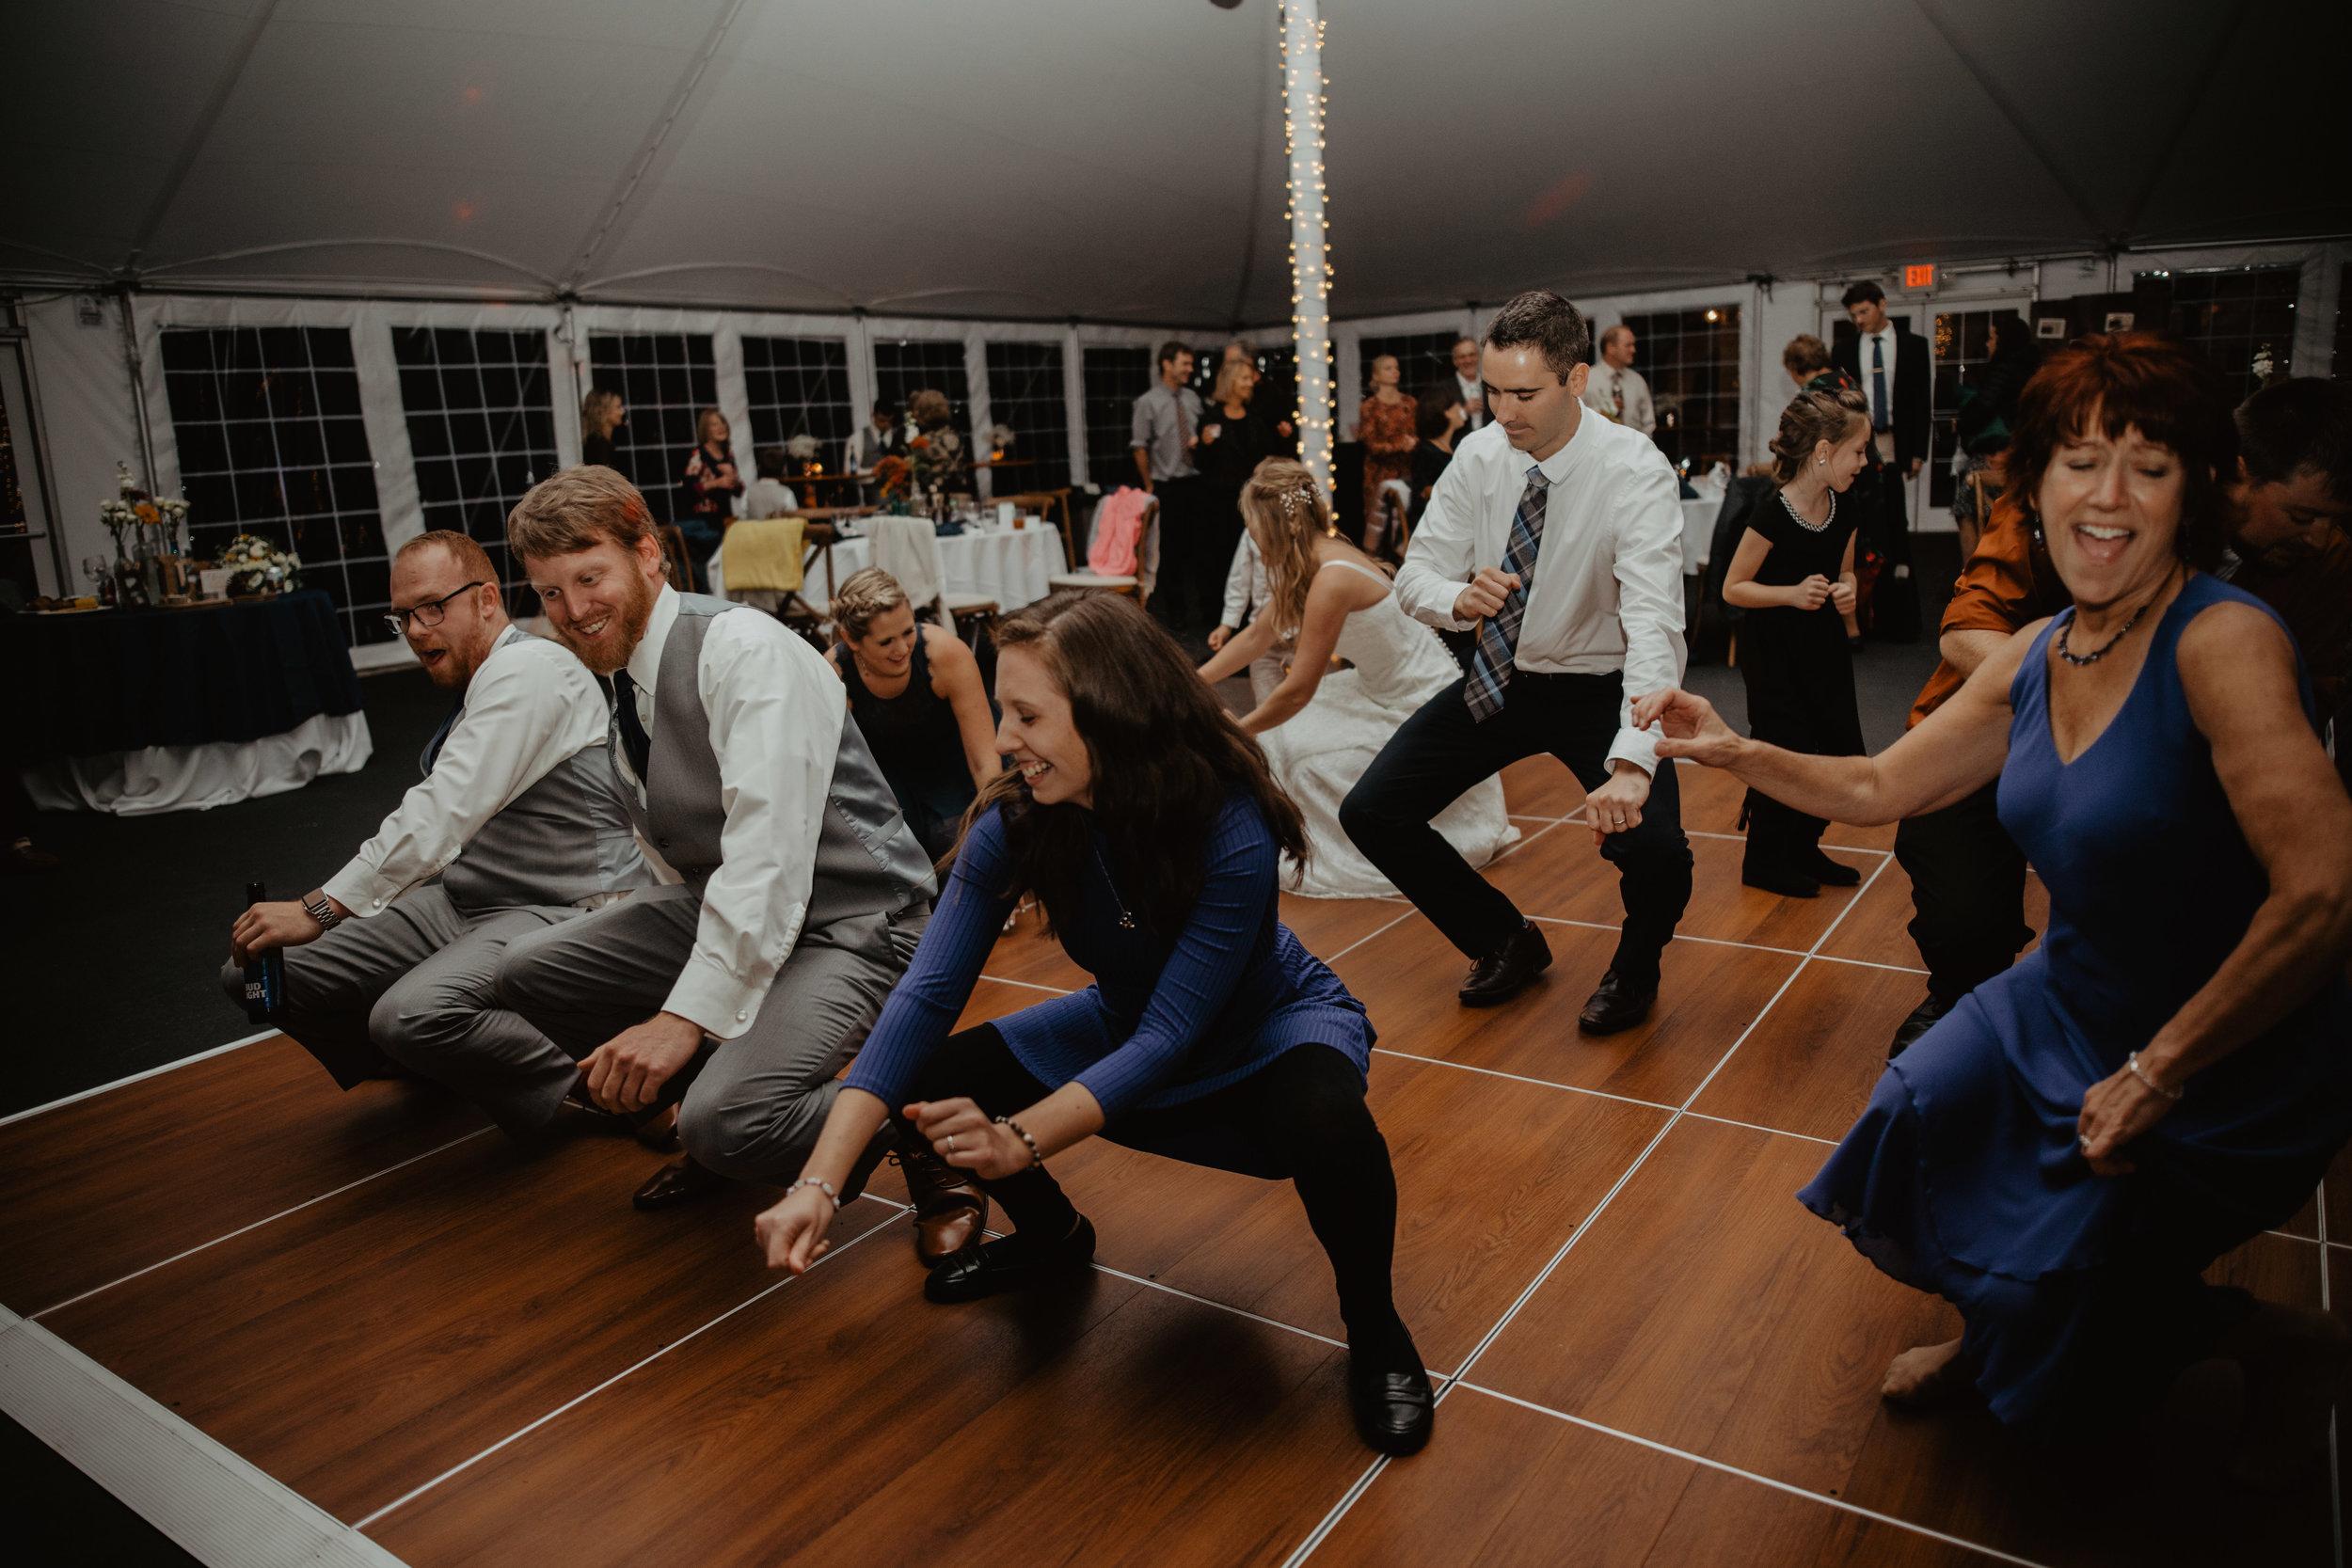 Vermont Wedding | Lorianna Weathers Photography-2180.jpg